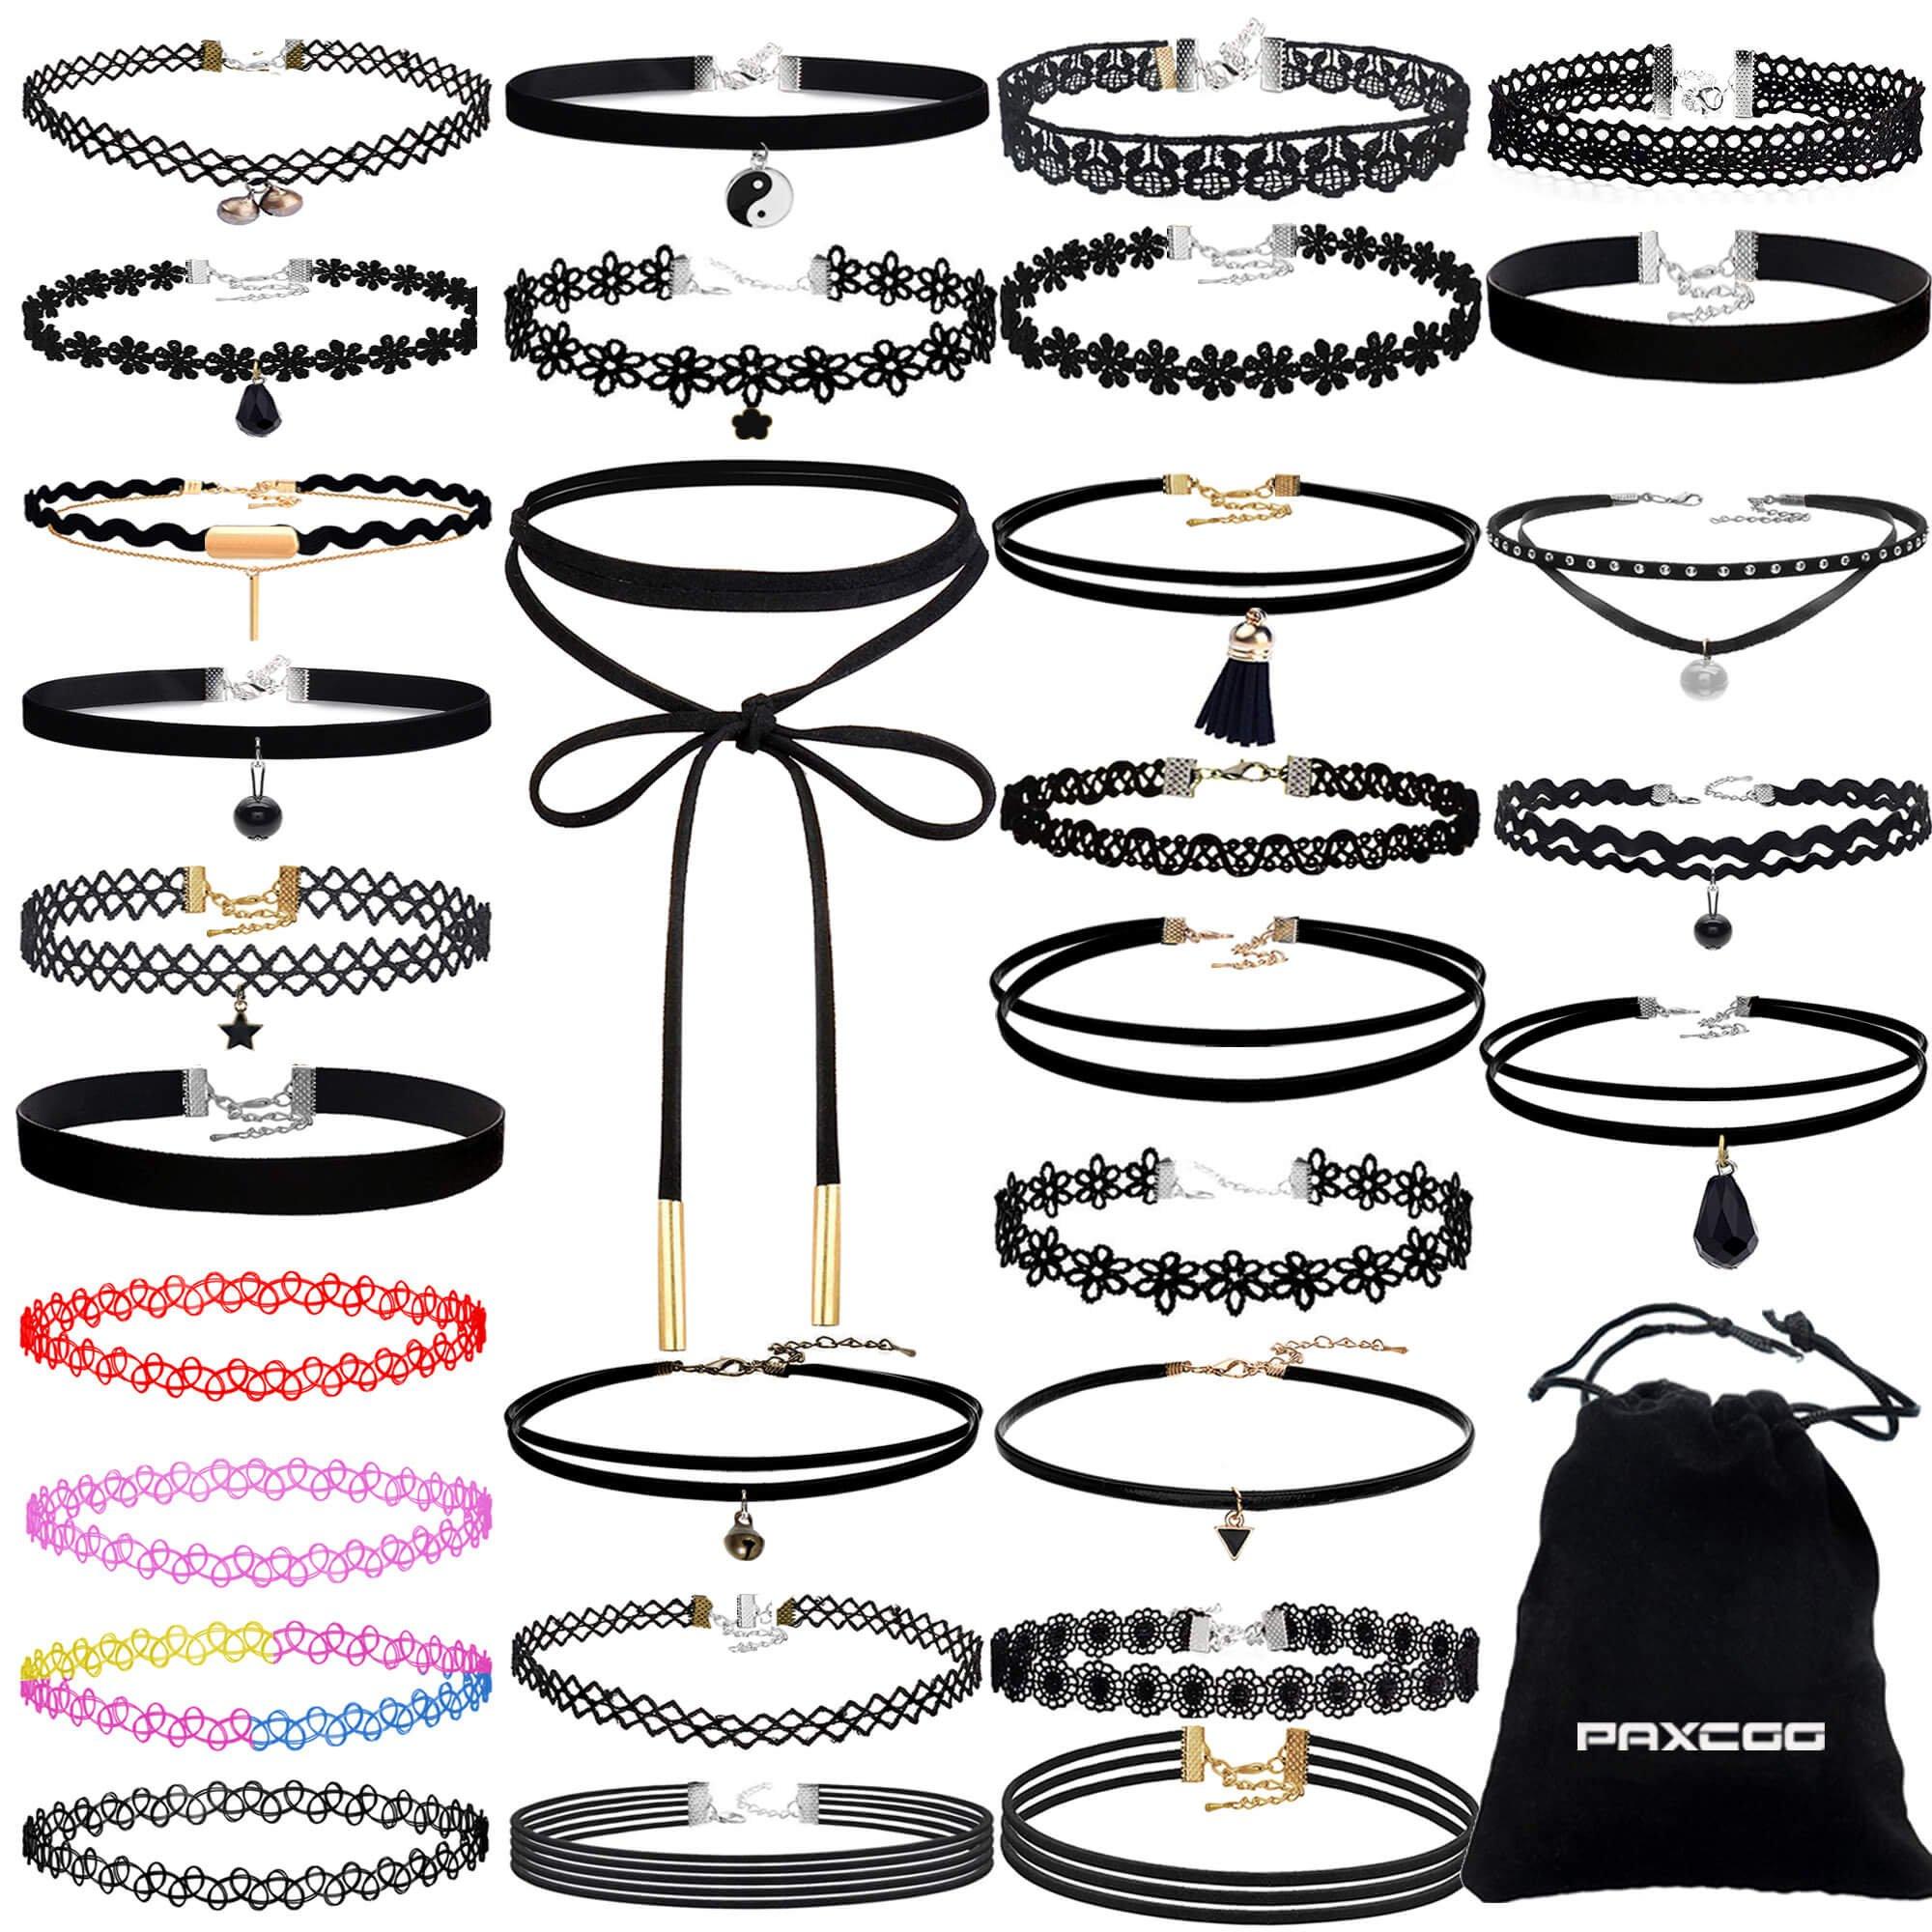 PAXCOO 36 PCS Choker Necklaces Set Including 30 Pcs Black Choker Necklaces and 6 Pcs Extender Chains for Women Girls